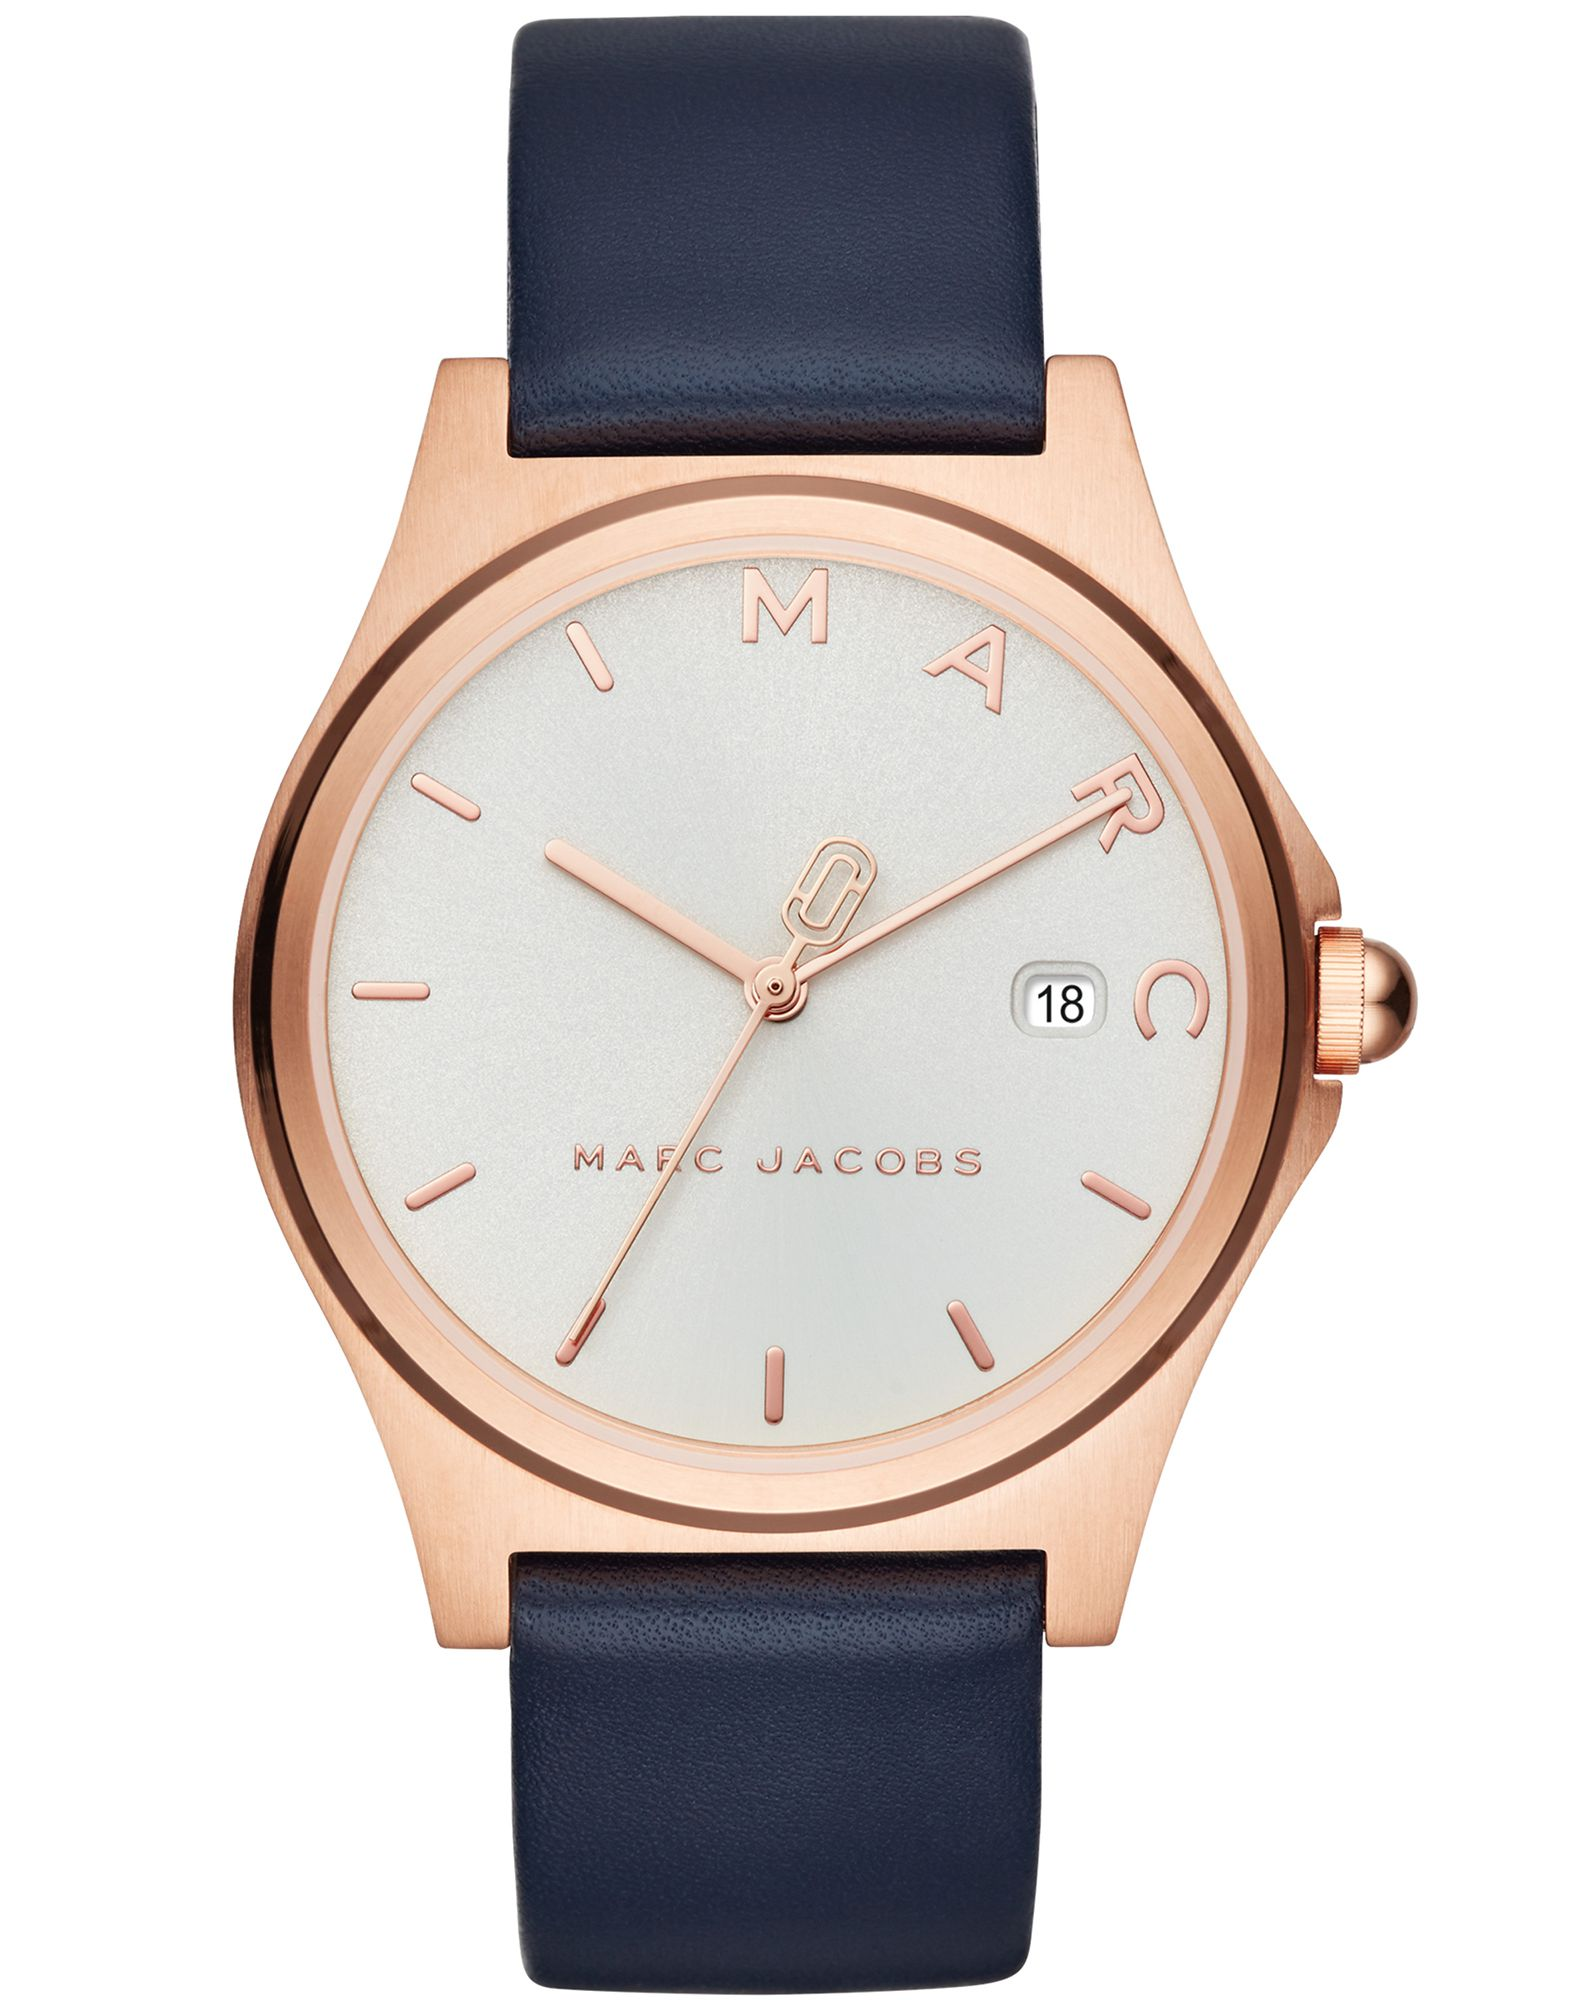 Orologio Da Polso Marc Jacobs Henry - Donna - Acquista online su